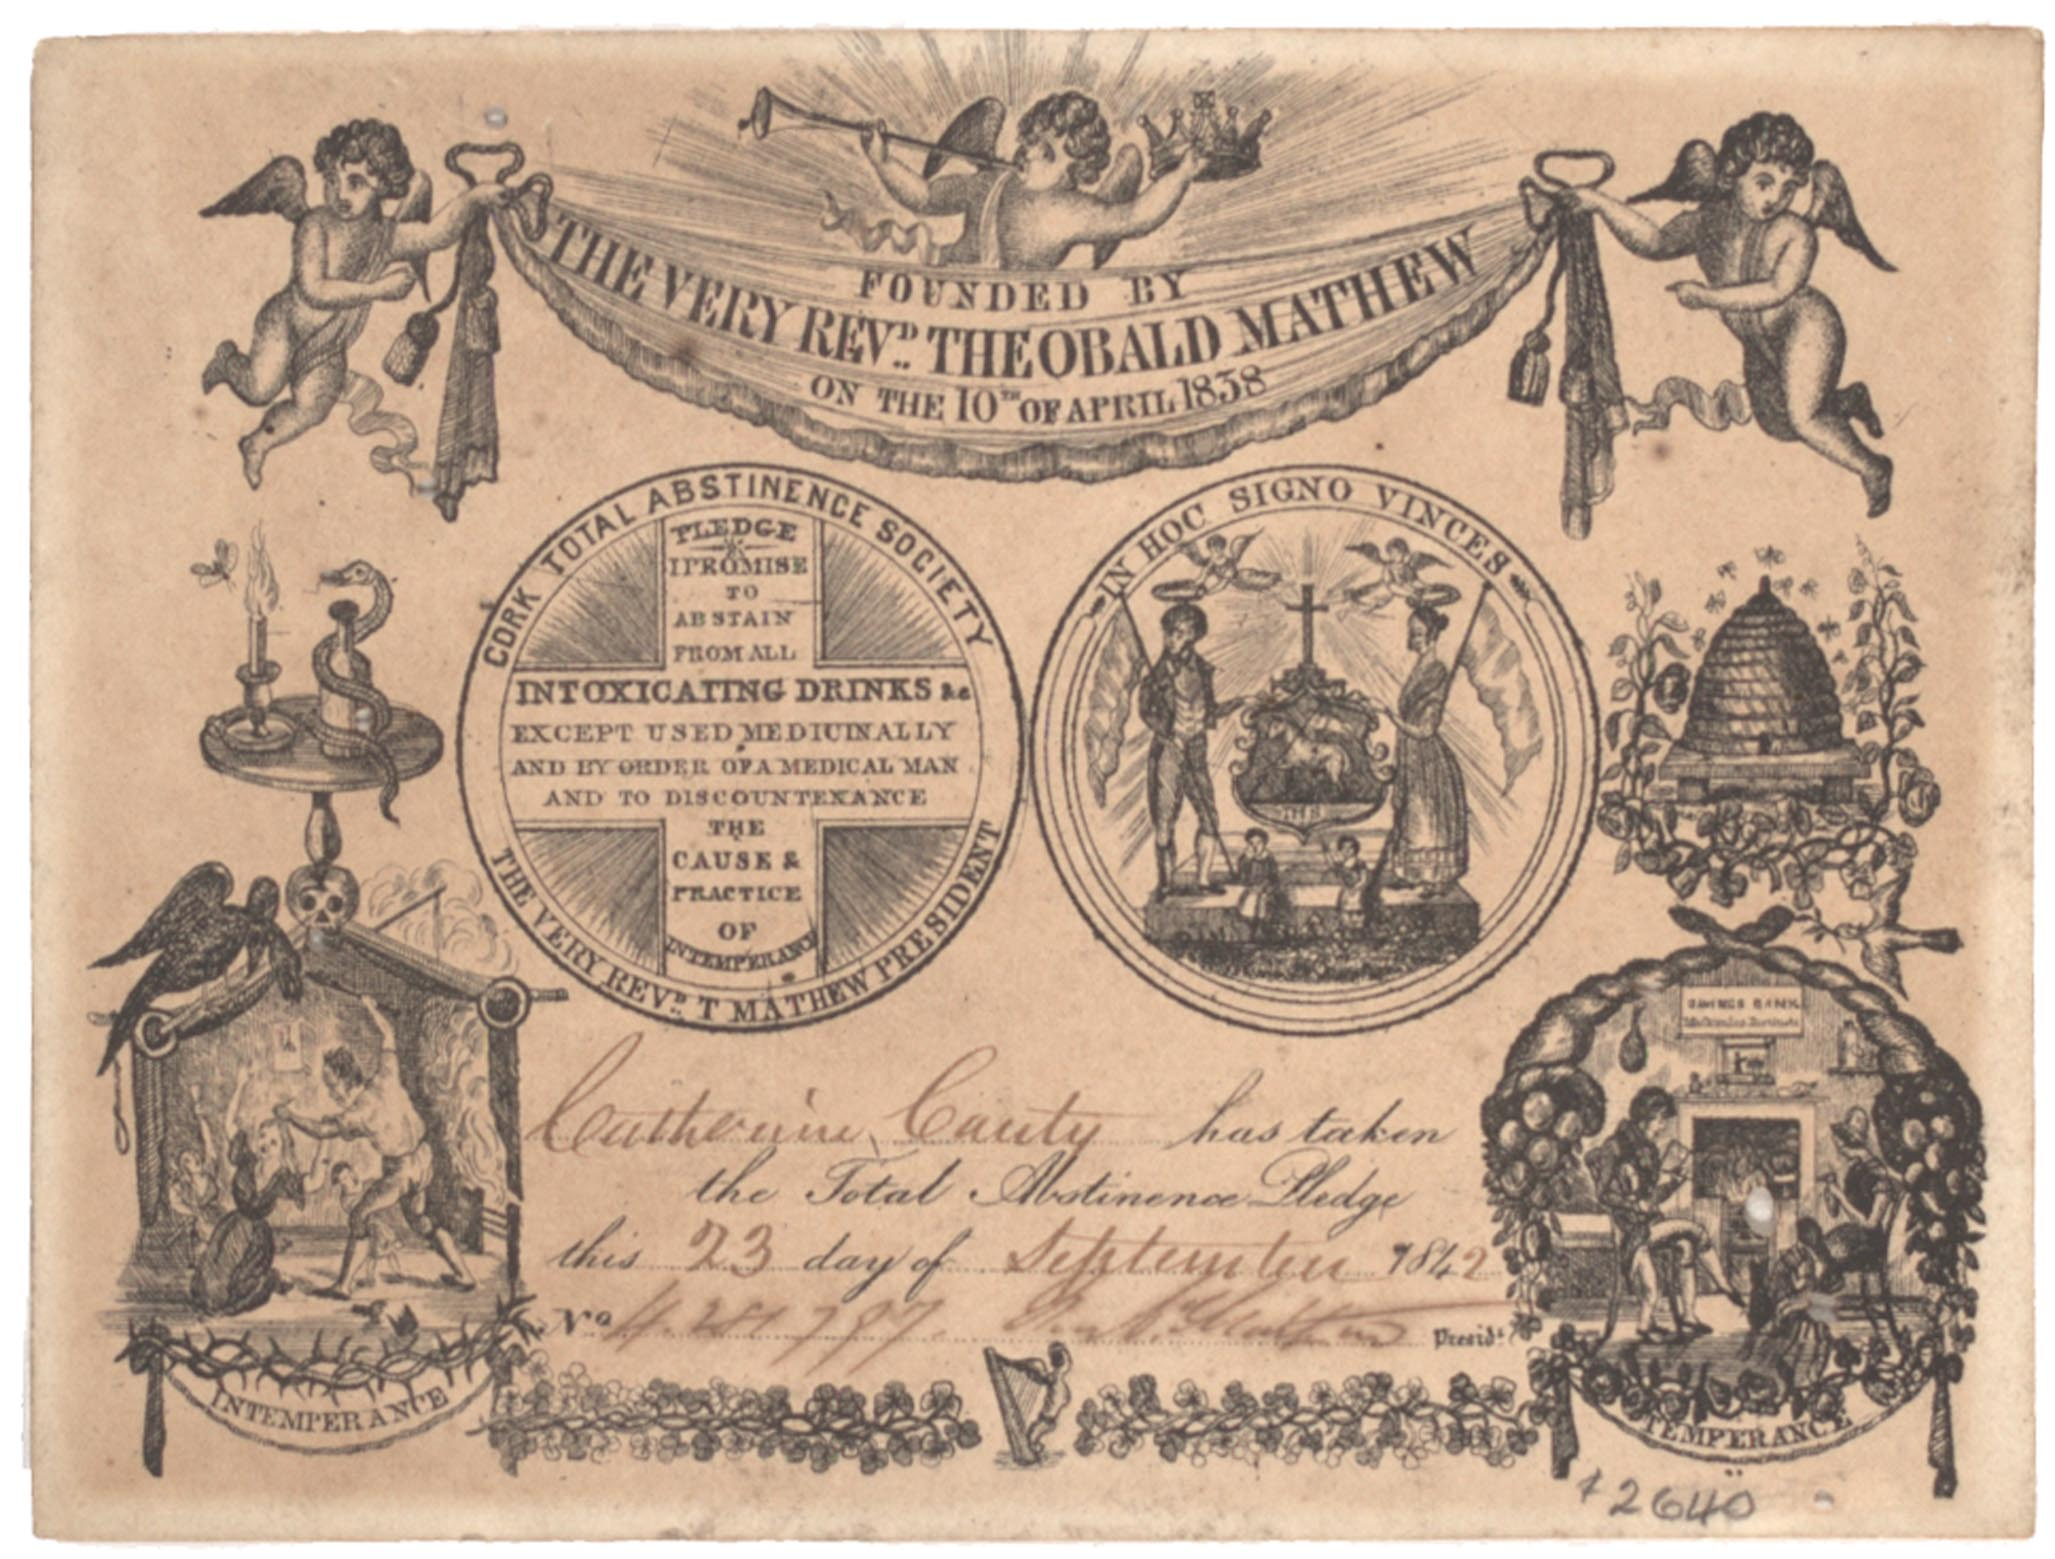 [Abstinence pledge card], September 23, 1842 (Gilder Lehrman Collection)